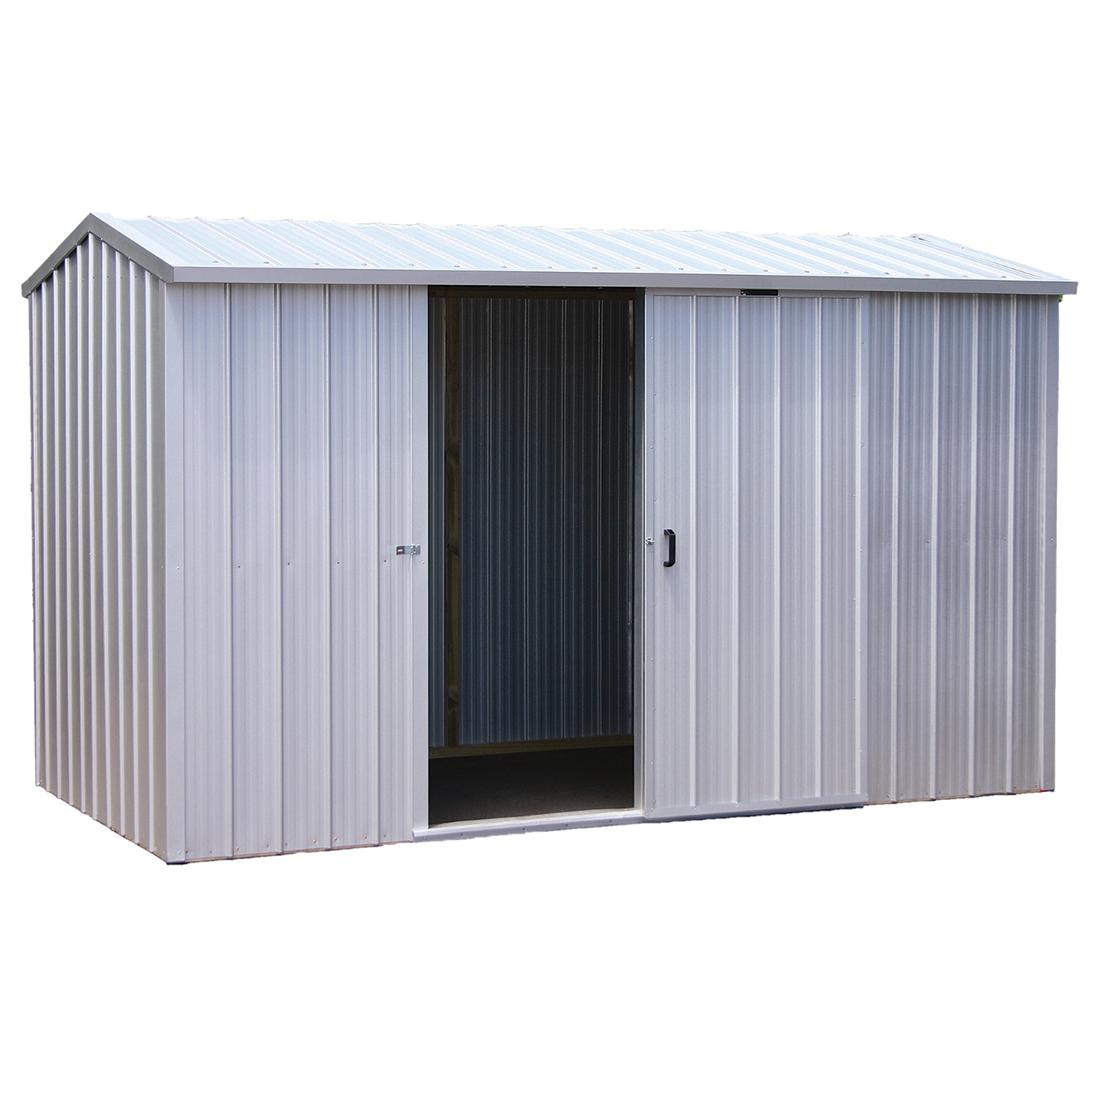 Kiwi Zinc Kitset Garden Shed 3.38 x 1.715 x 2.11m